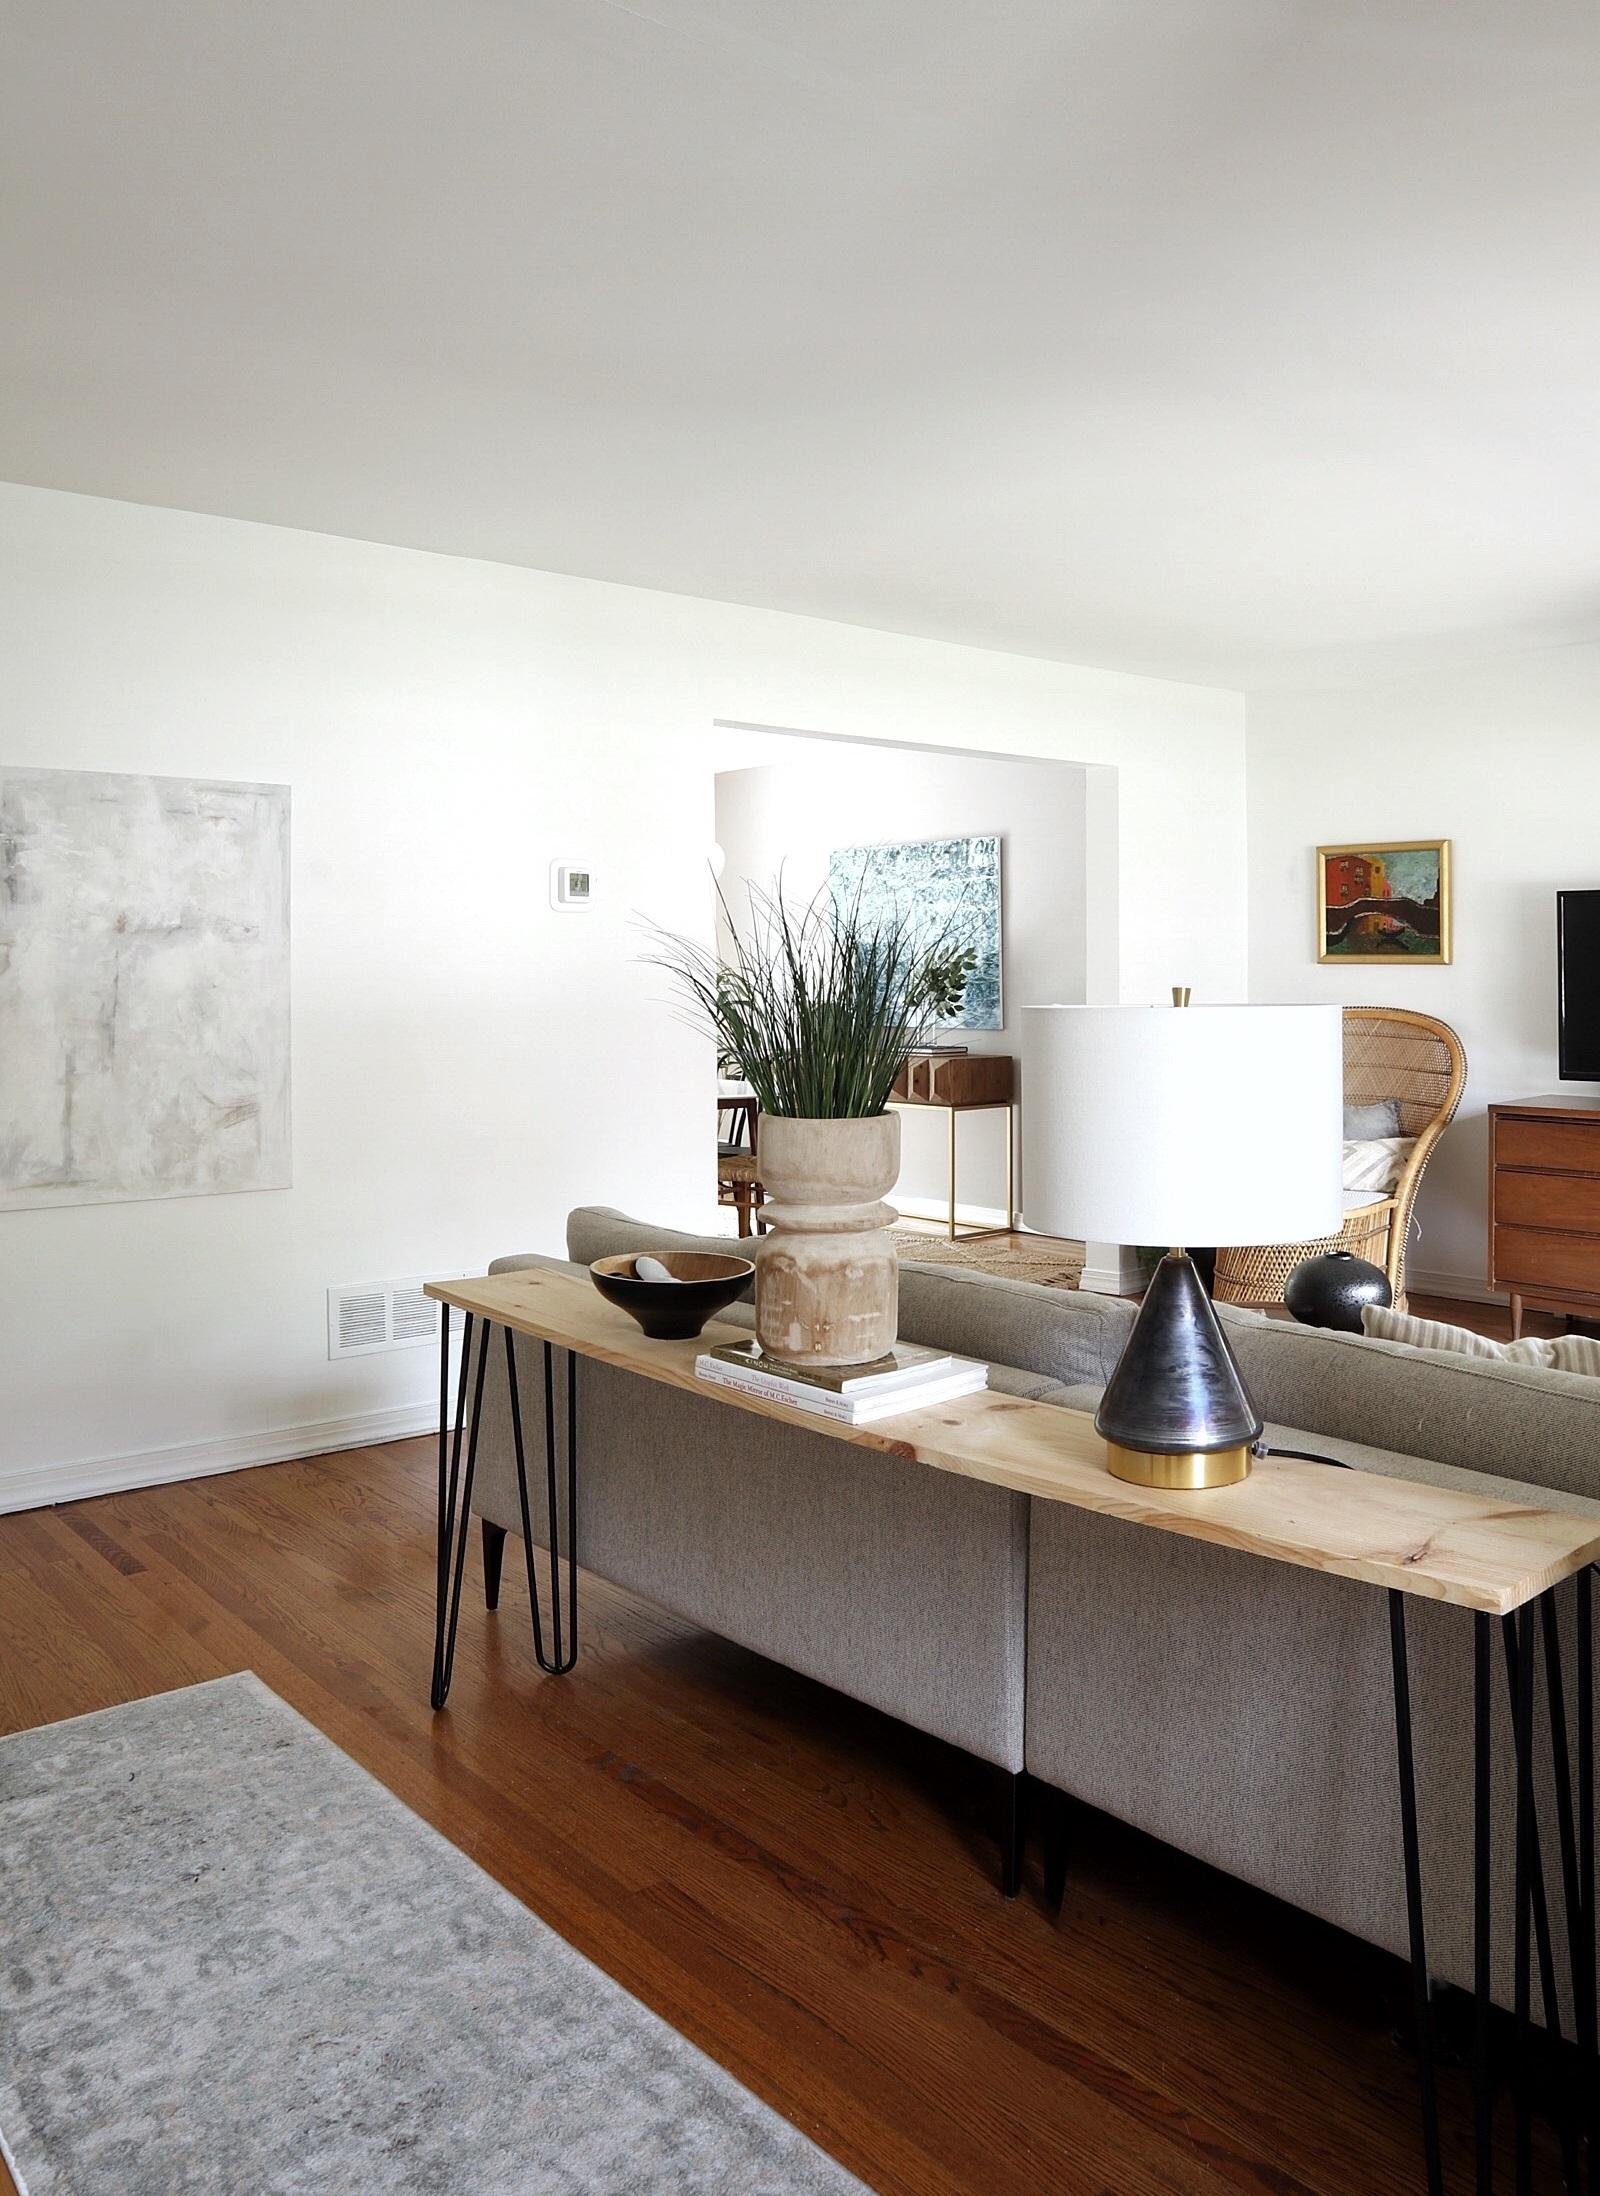 diy-console-living-room-decor.jpg